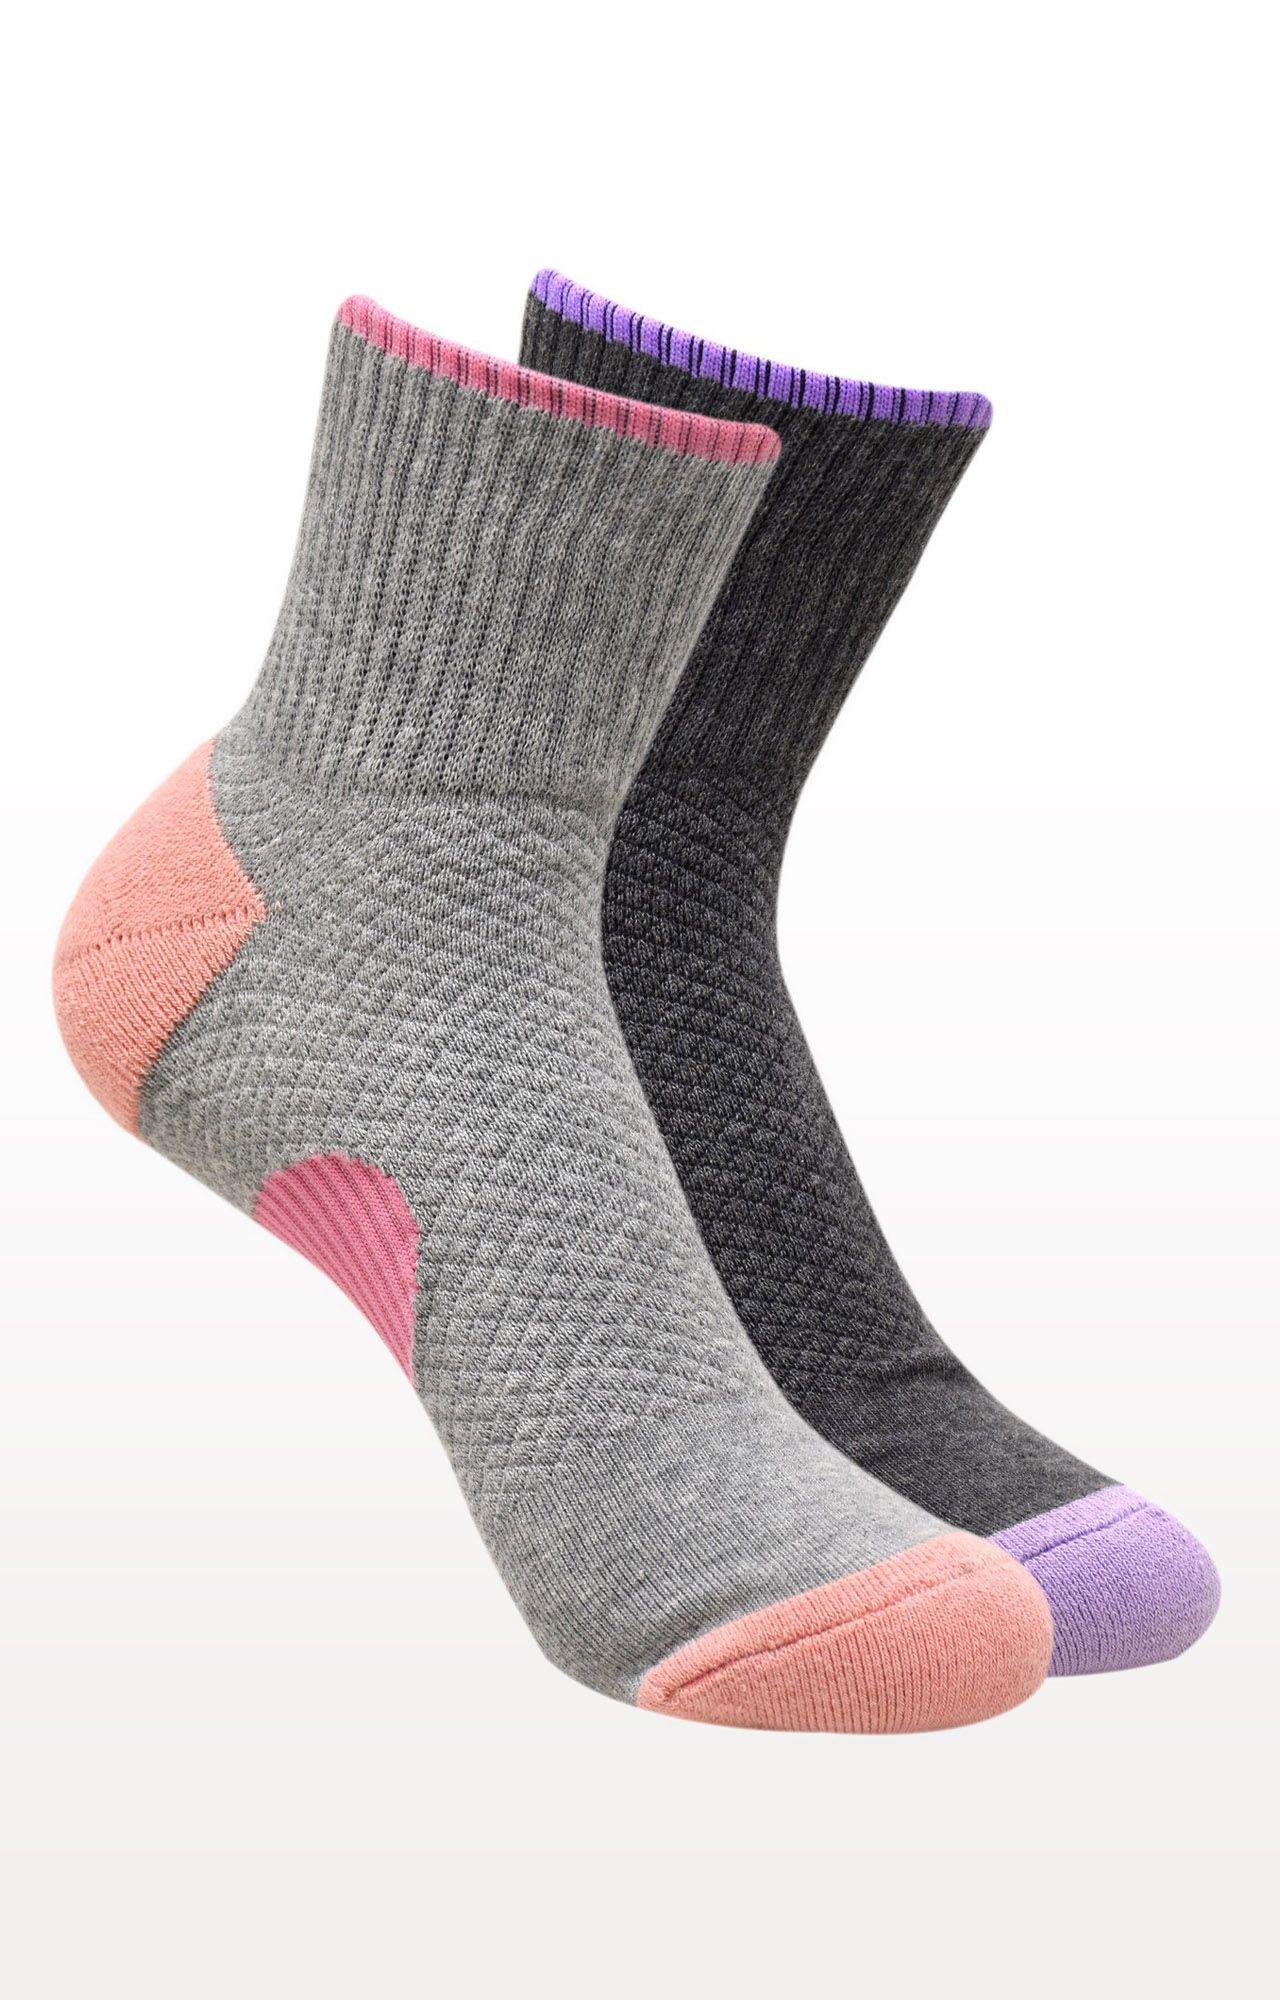 BALENZIA   Light Grey and Dark Grey Printed Socks - (Pack of 2)